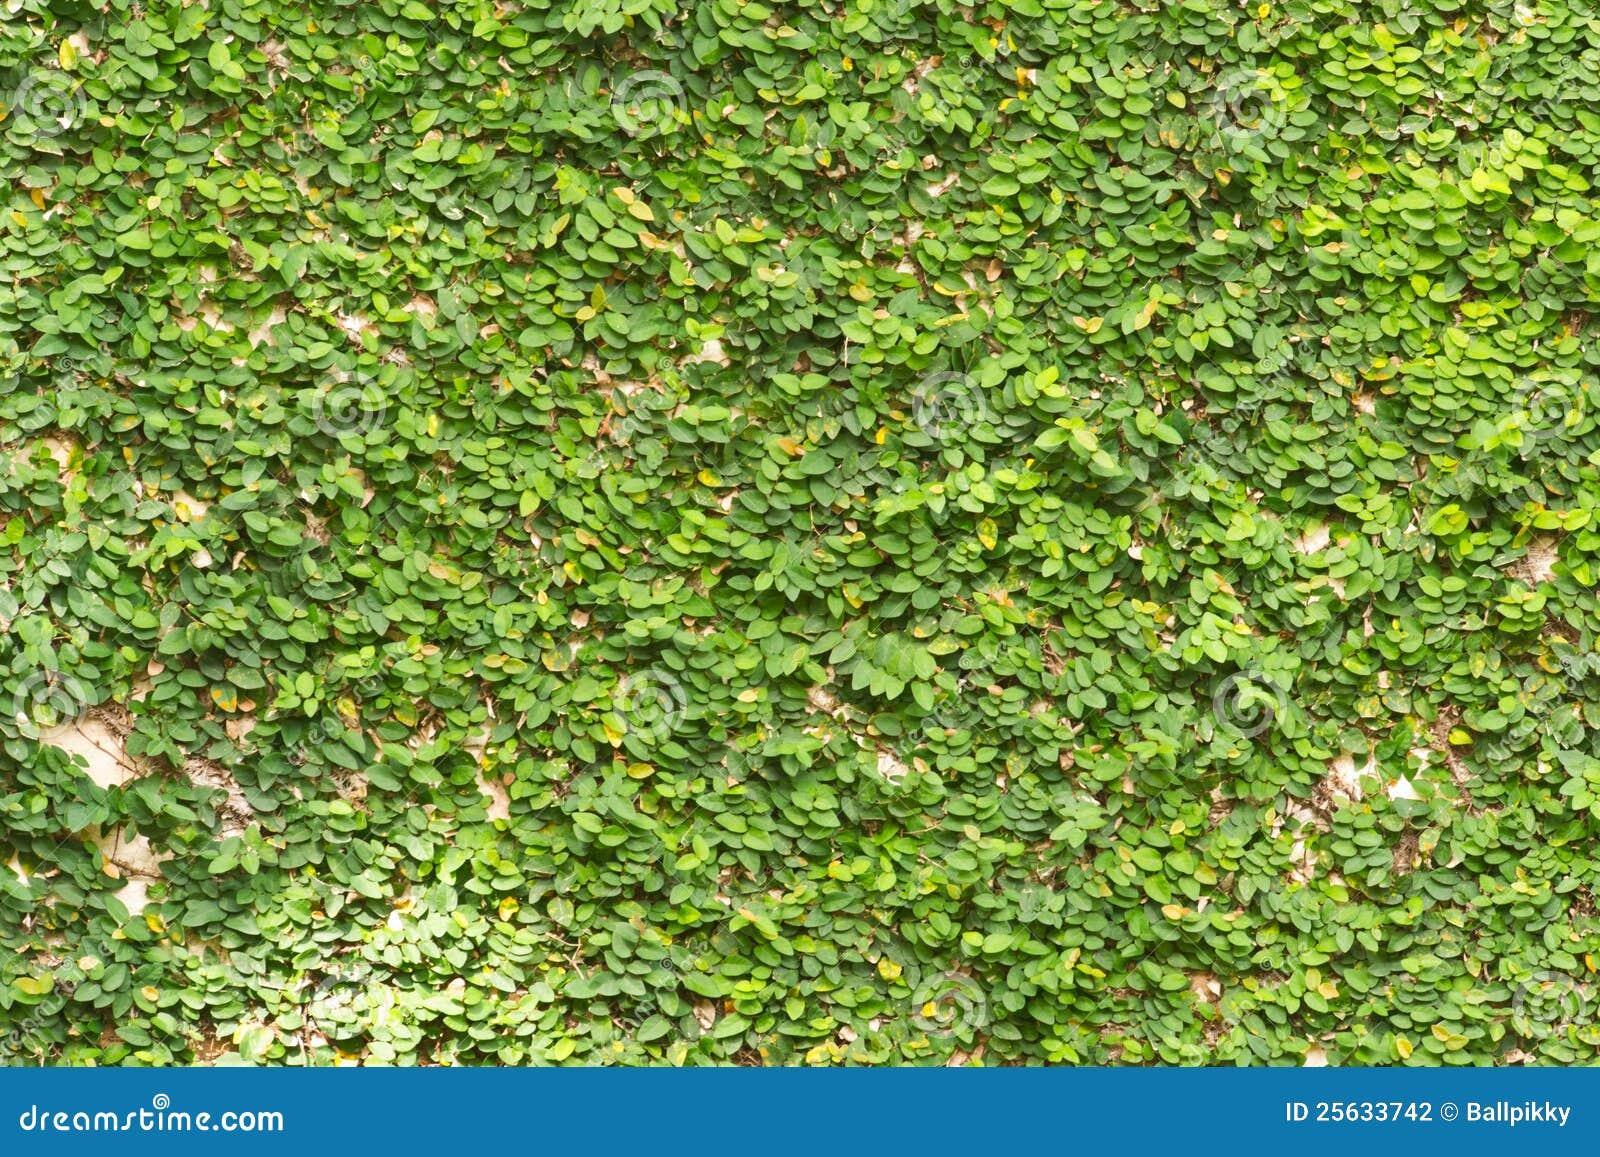 Paredes Verdes Fotografia De Stock Imagem 25633742